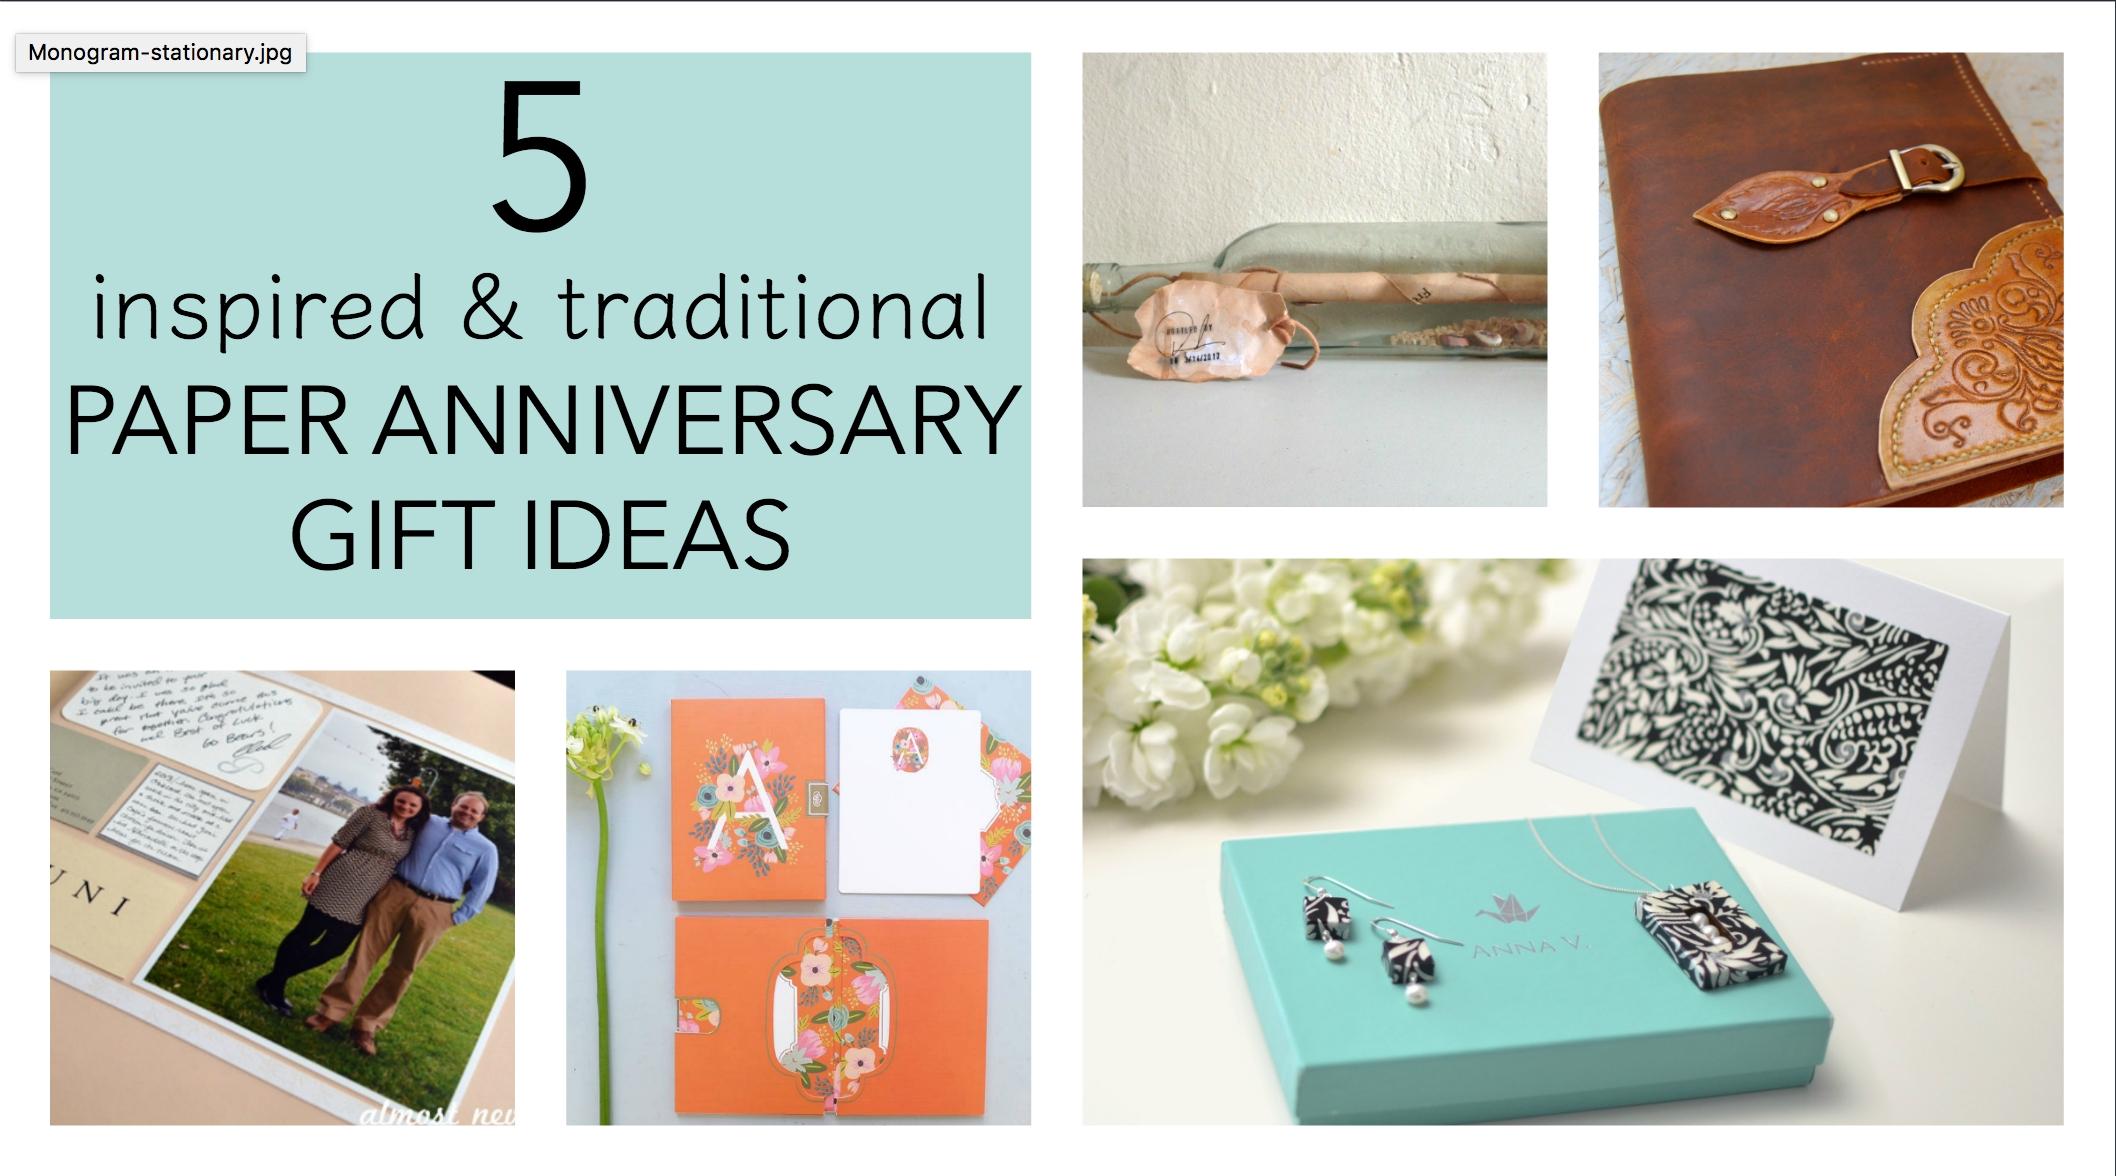 10 Stylish 1St Anniversary Ideas For Him home paper anniversaryanna v